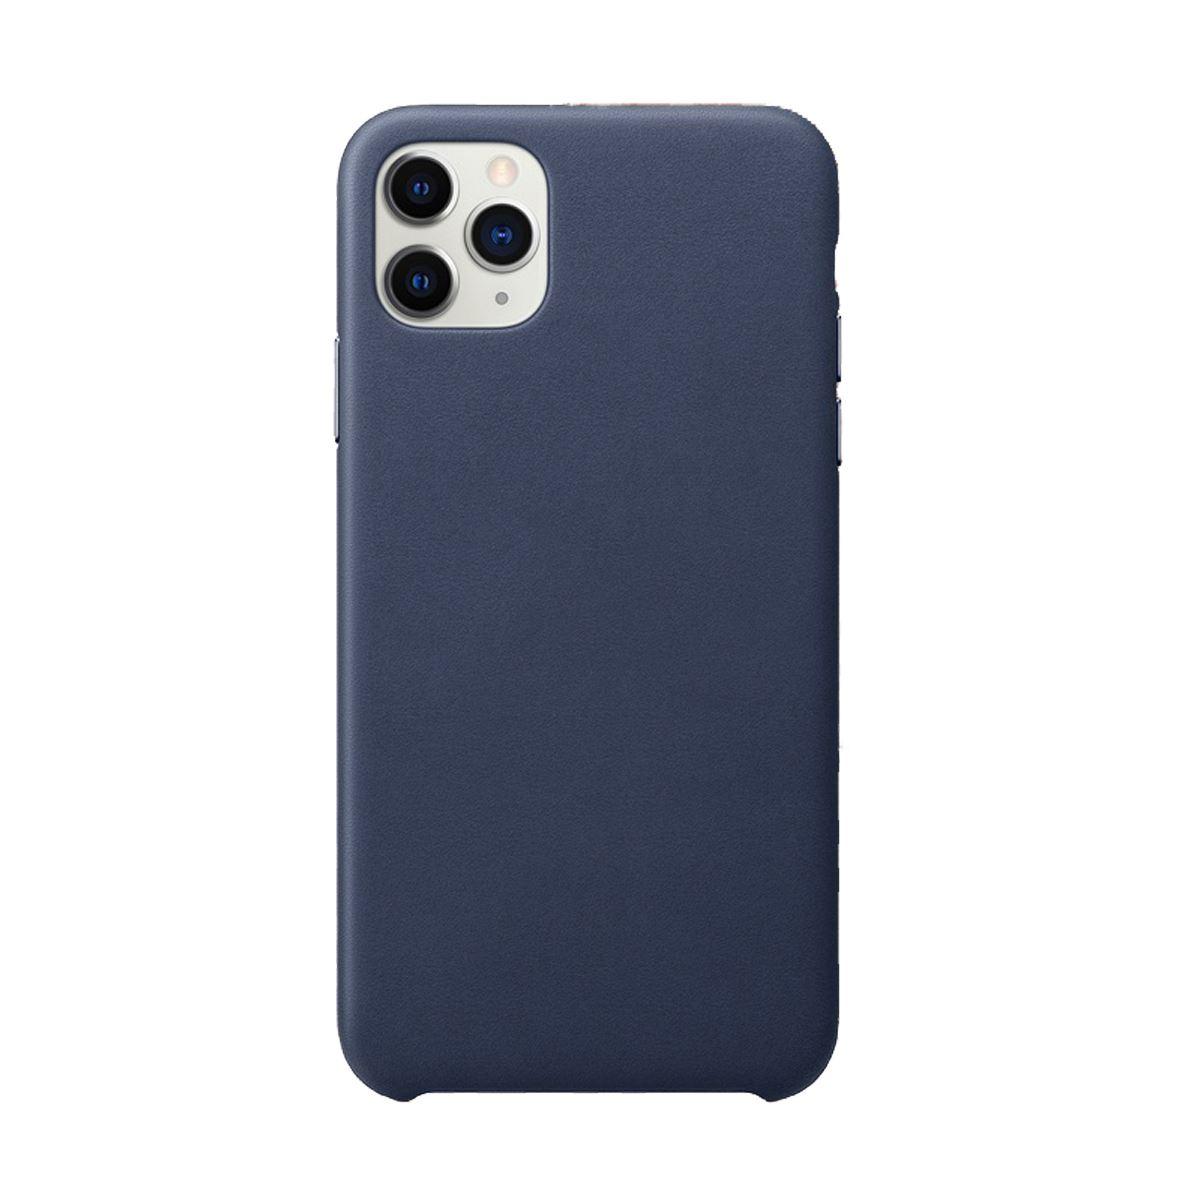 Leather-Slim-Case-Apple-iPhone-10-8-7-Plus-6s-5-Original-PU-Soft-Silicone-Cover thumbnail 11